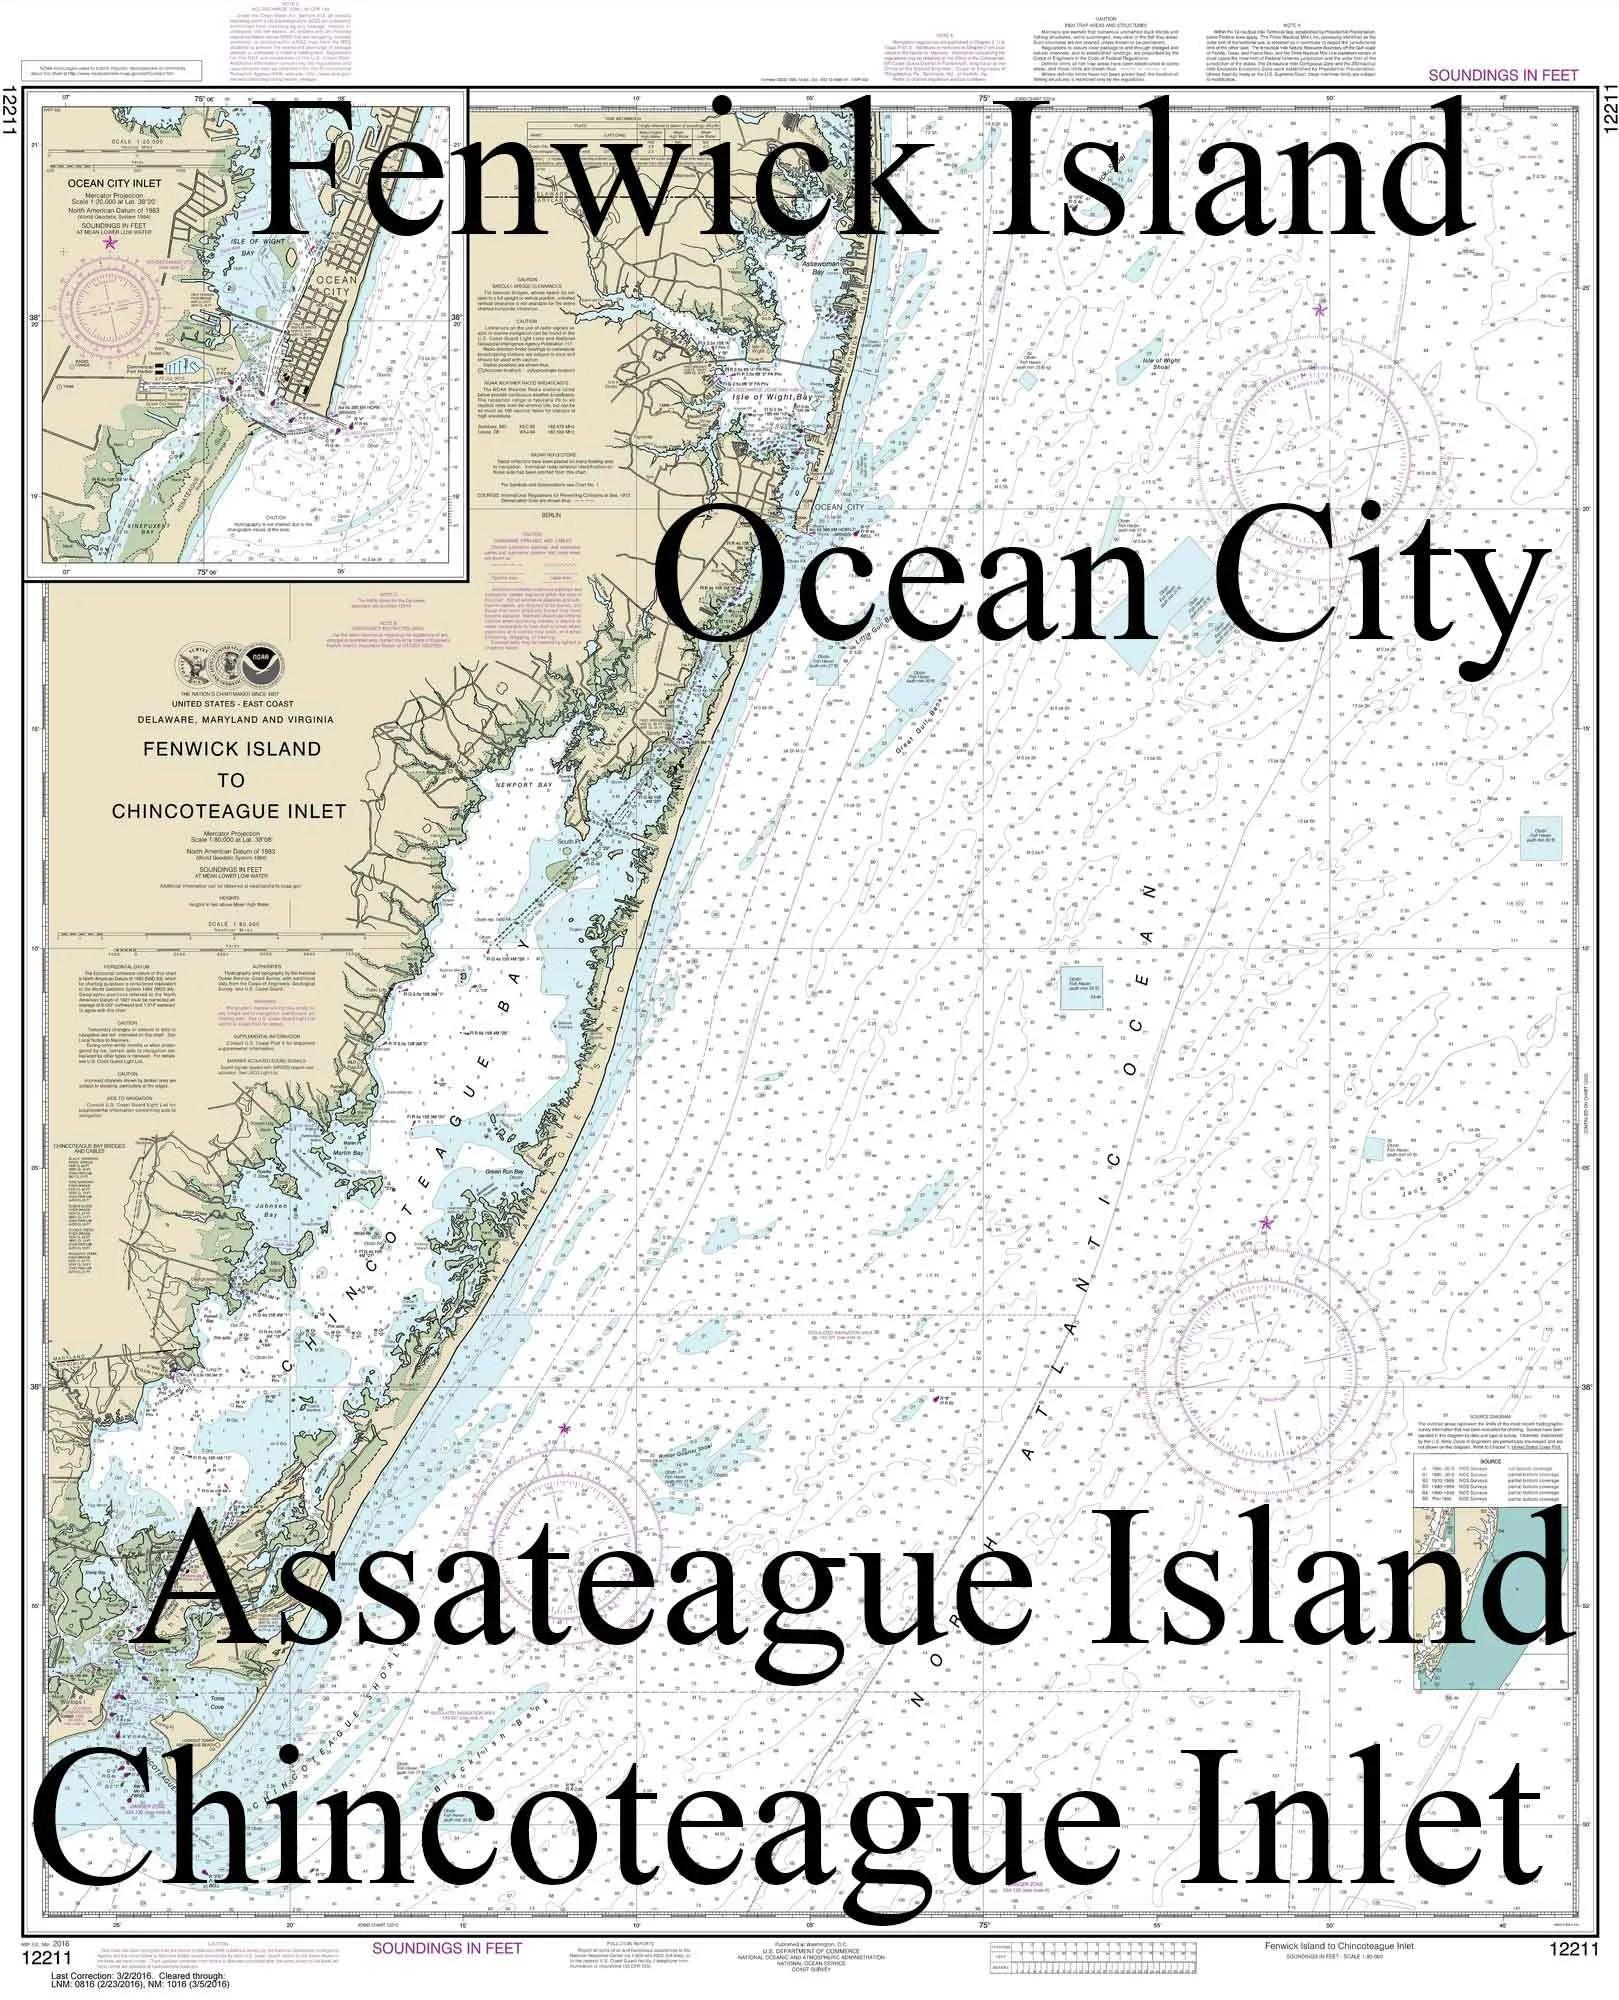 Fenwick Island to Chincoteague Inlet-2014 Nautical Map Etsy